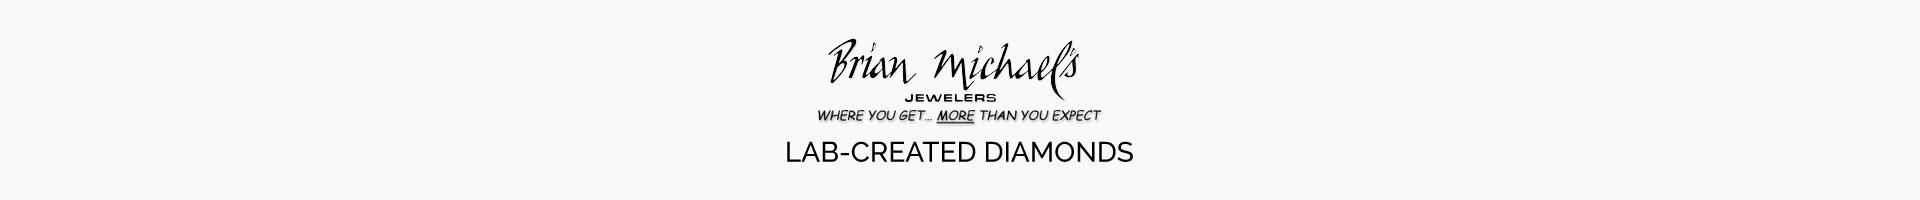 Brian Michael's Diamonds Banner